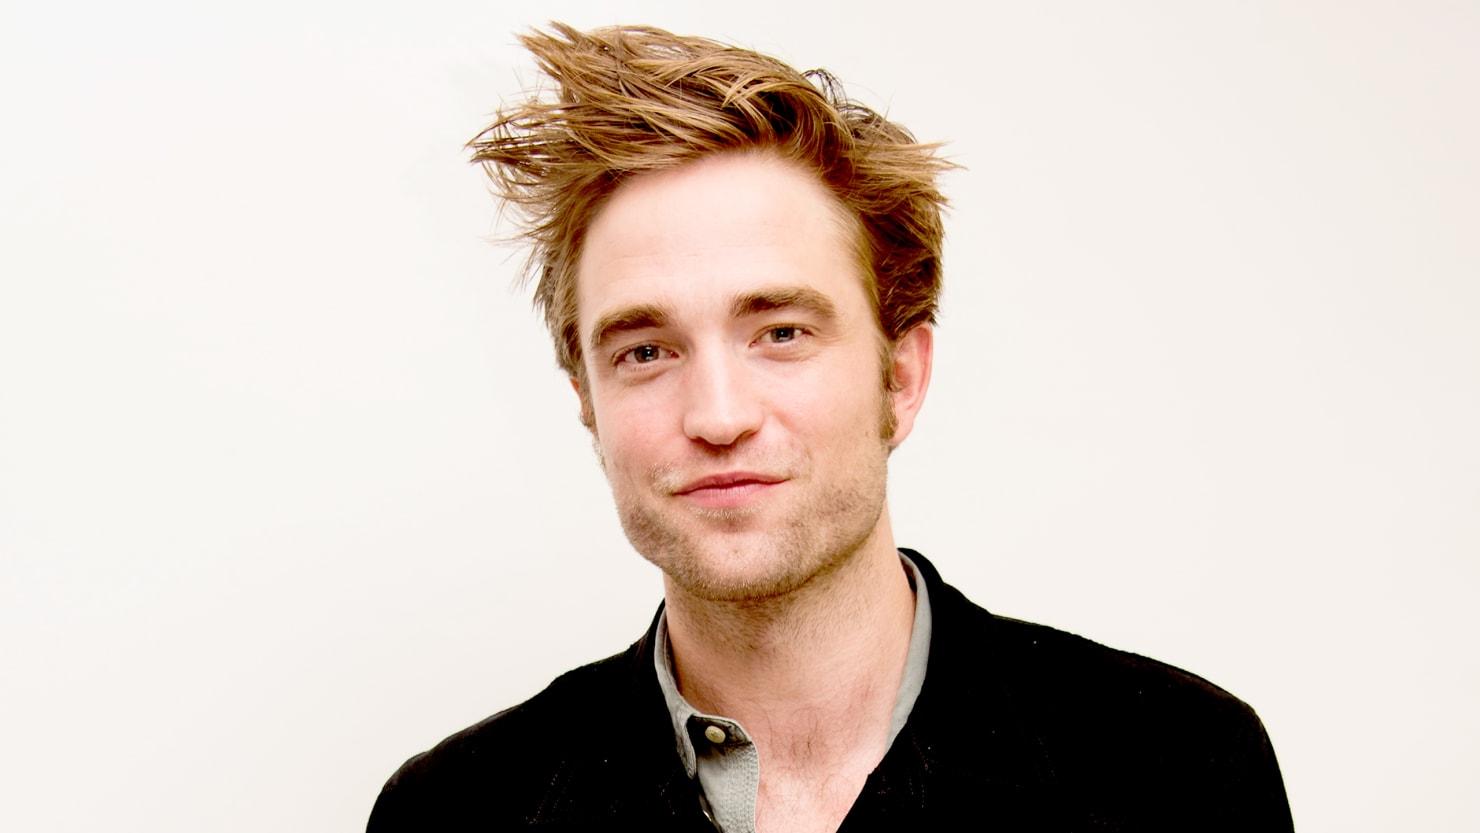 Robert Pattinson will be a billionaire 07.01.2011